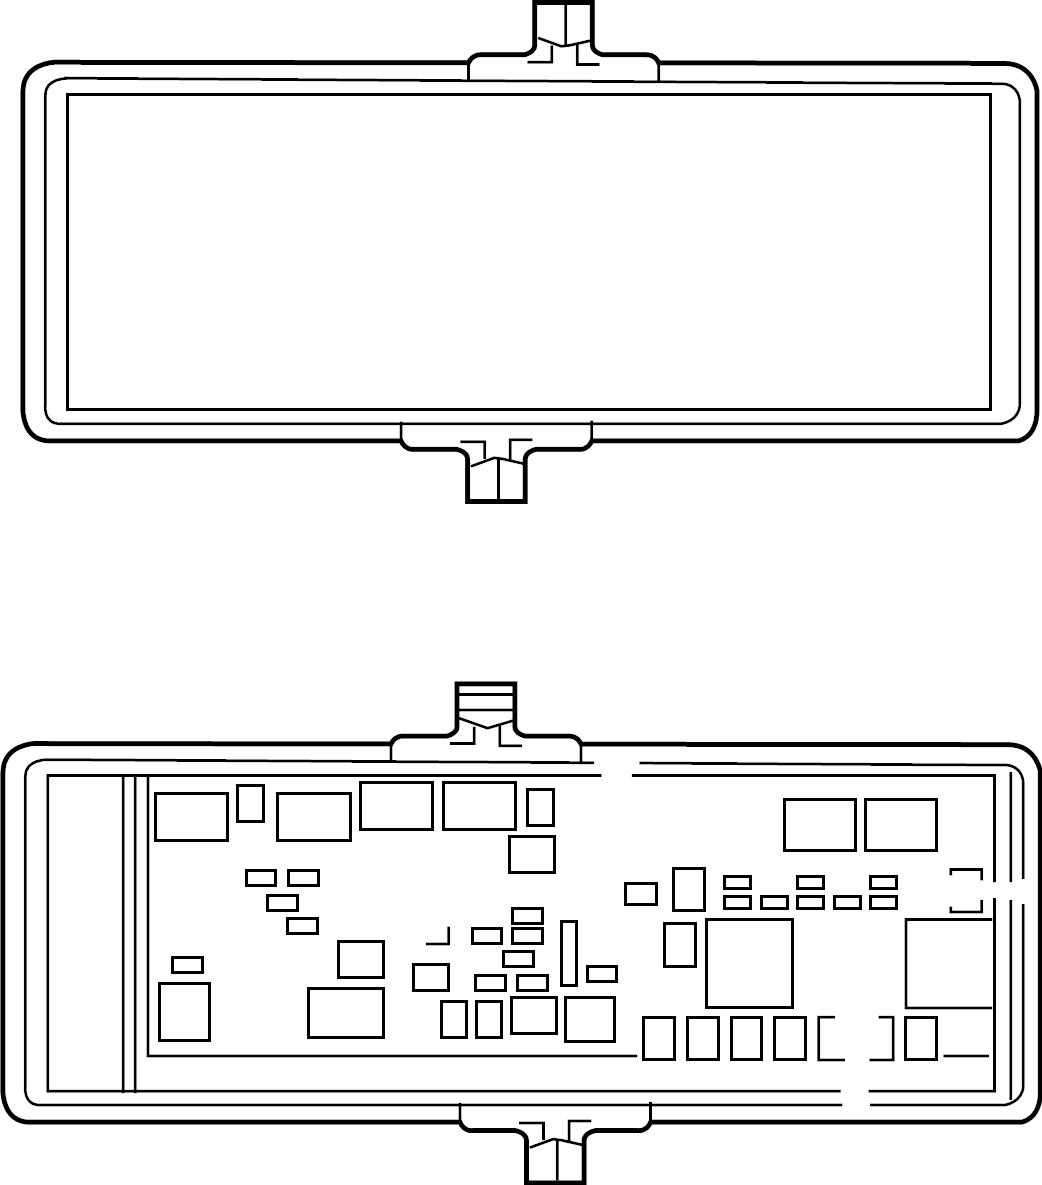 2016 dodge journey wiring diagram emc data 2013 fuse box